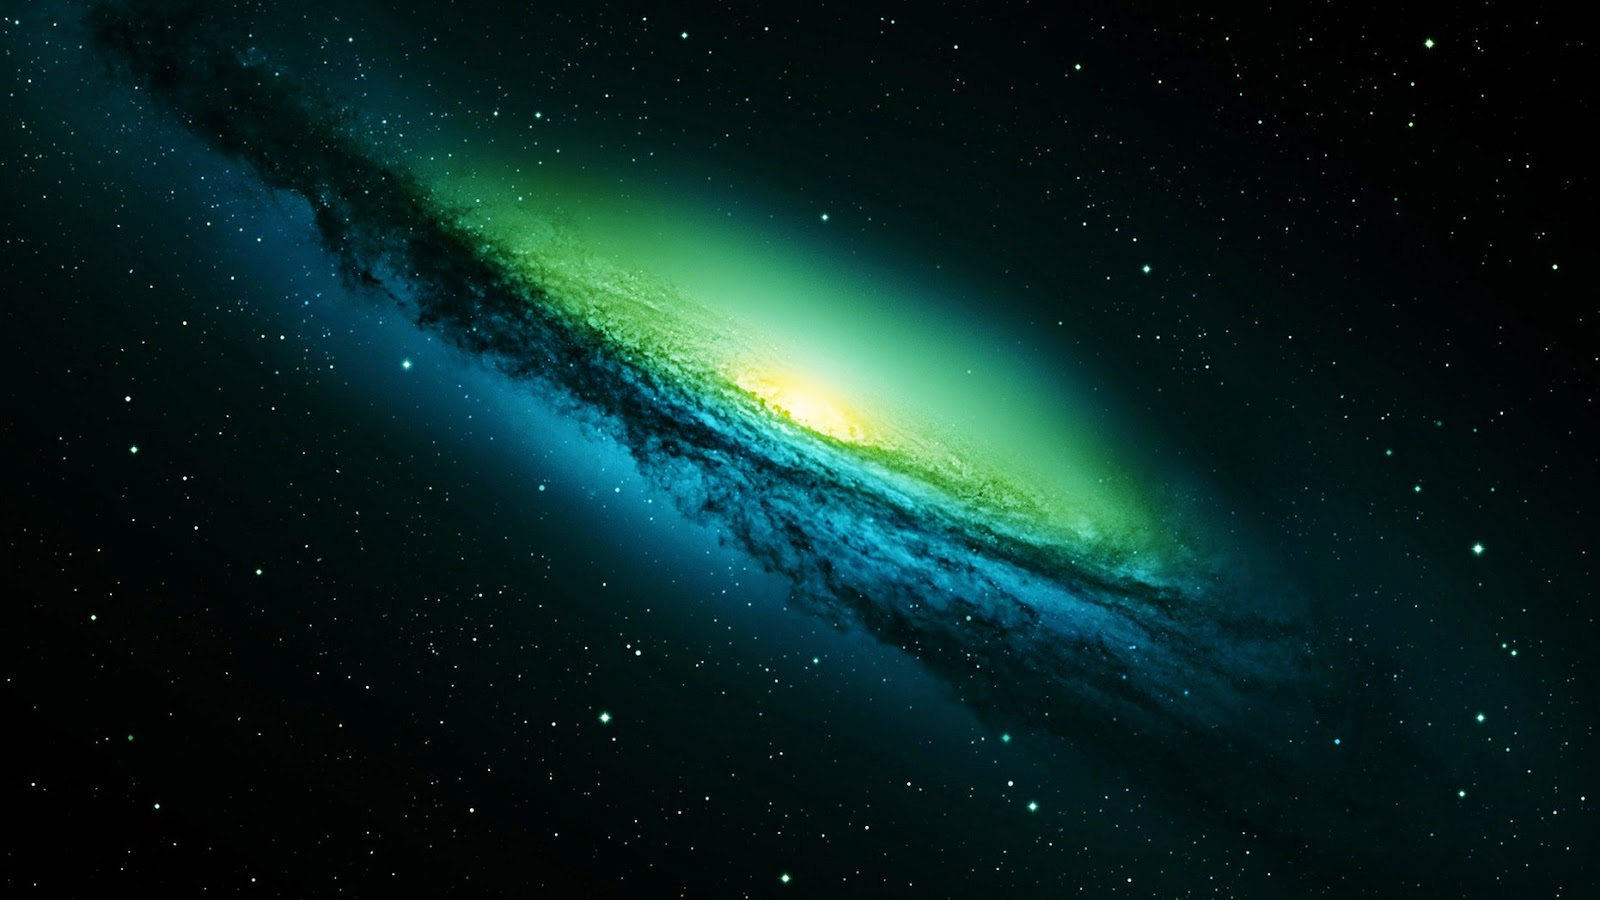 Galaxy Wallpaper Free Download: Galaxy Live Wallpaper iphone